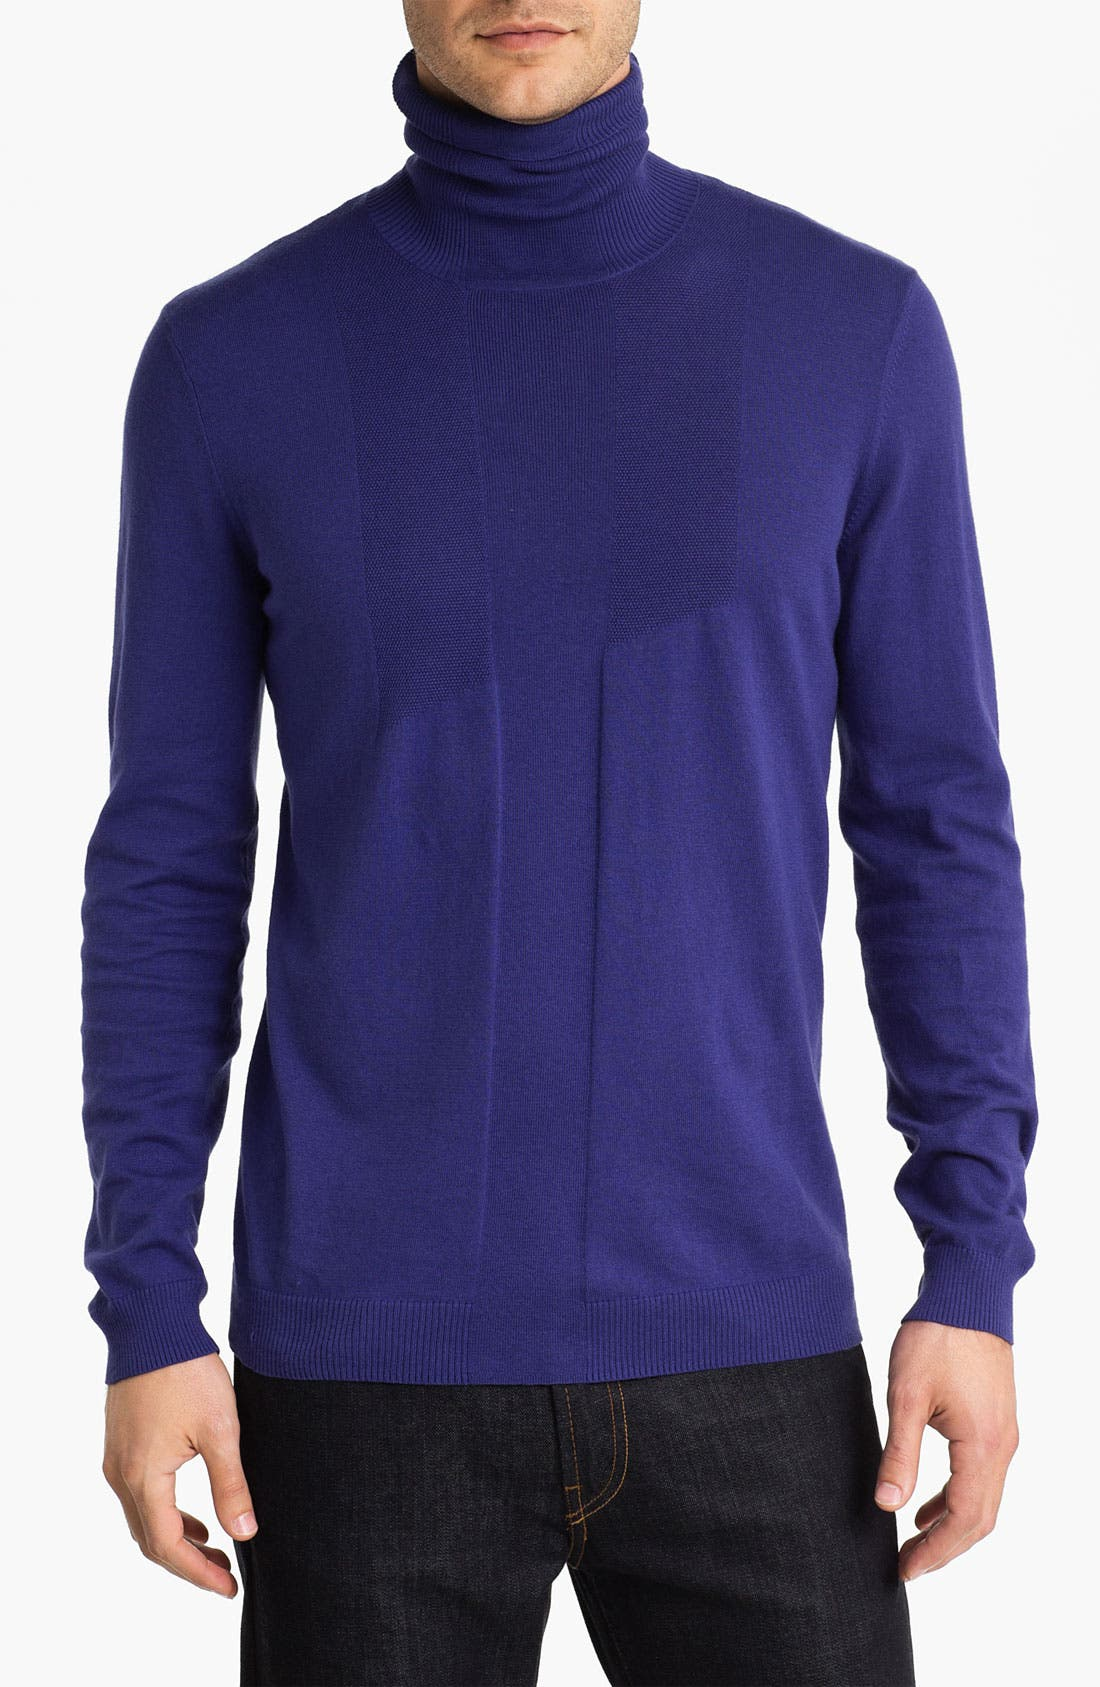 Main Image - HUGO 'Storte' Turtleneck Sweater